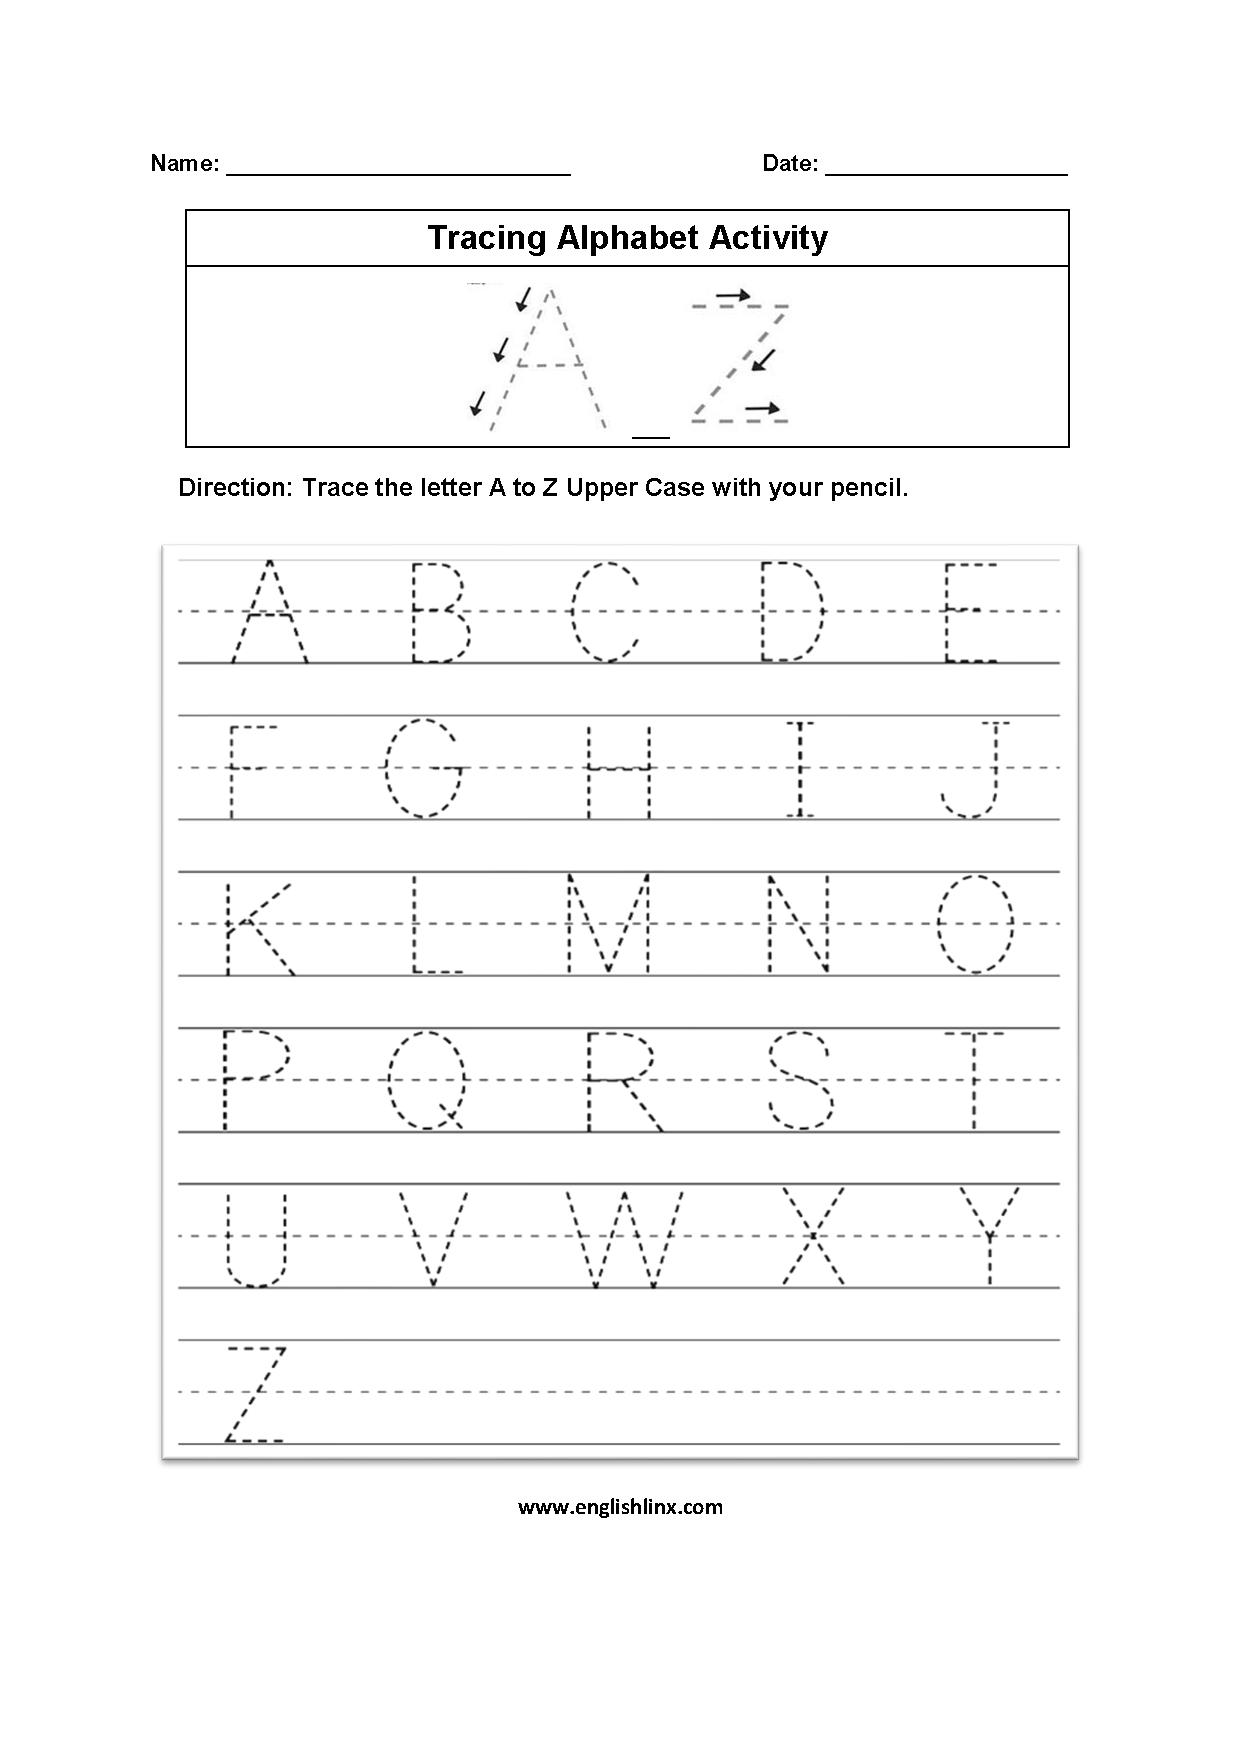 A To Z Alphabet Worksheets Pdf لم يسبق له مثيل الصور + Tier3.xyz intended for A-Z Alphabet Tracing Worksheets